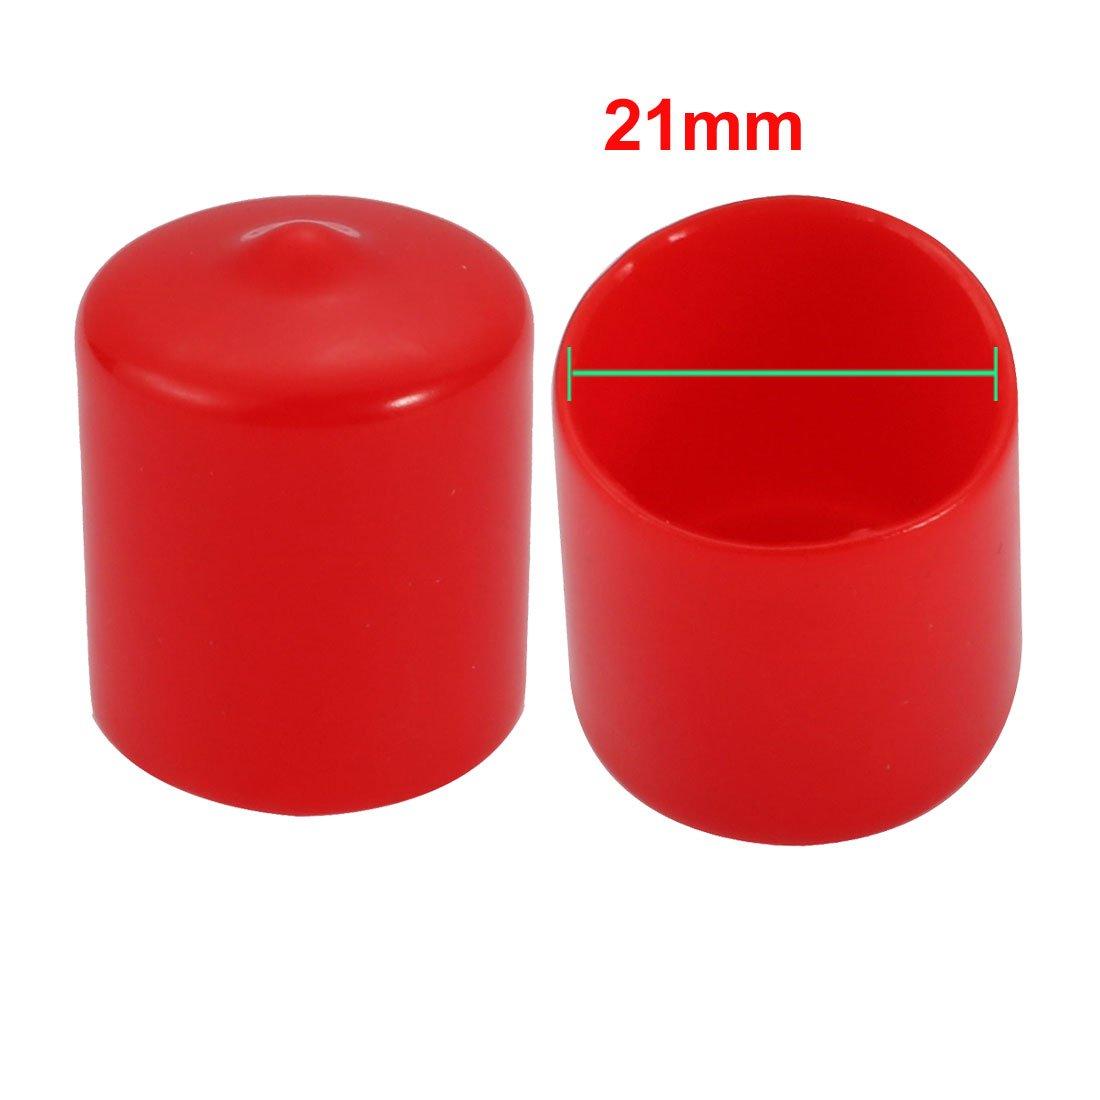 uxcell 20Pcs 21mm Inner Dia PVC Flexible Vinyl End Cap Screw Thread Protector Cover Red